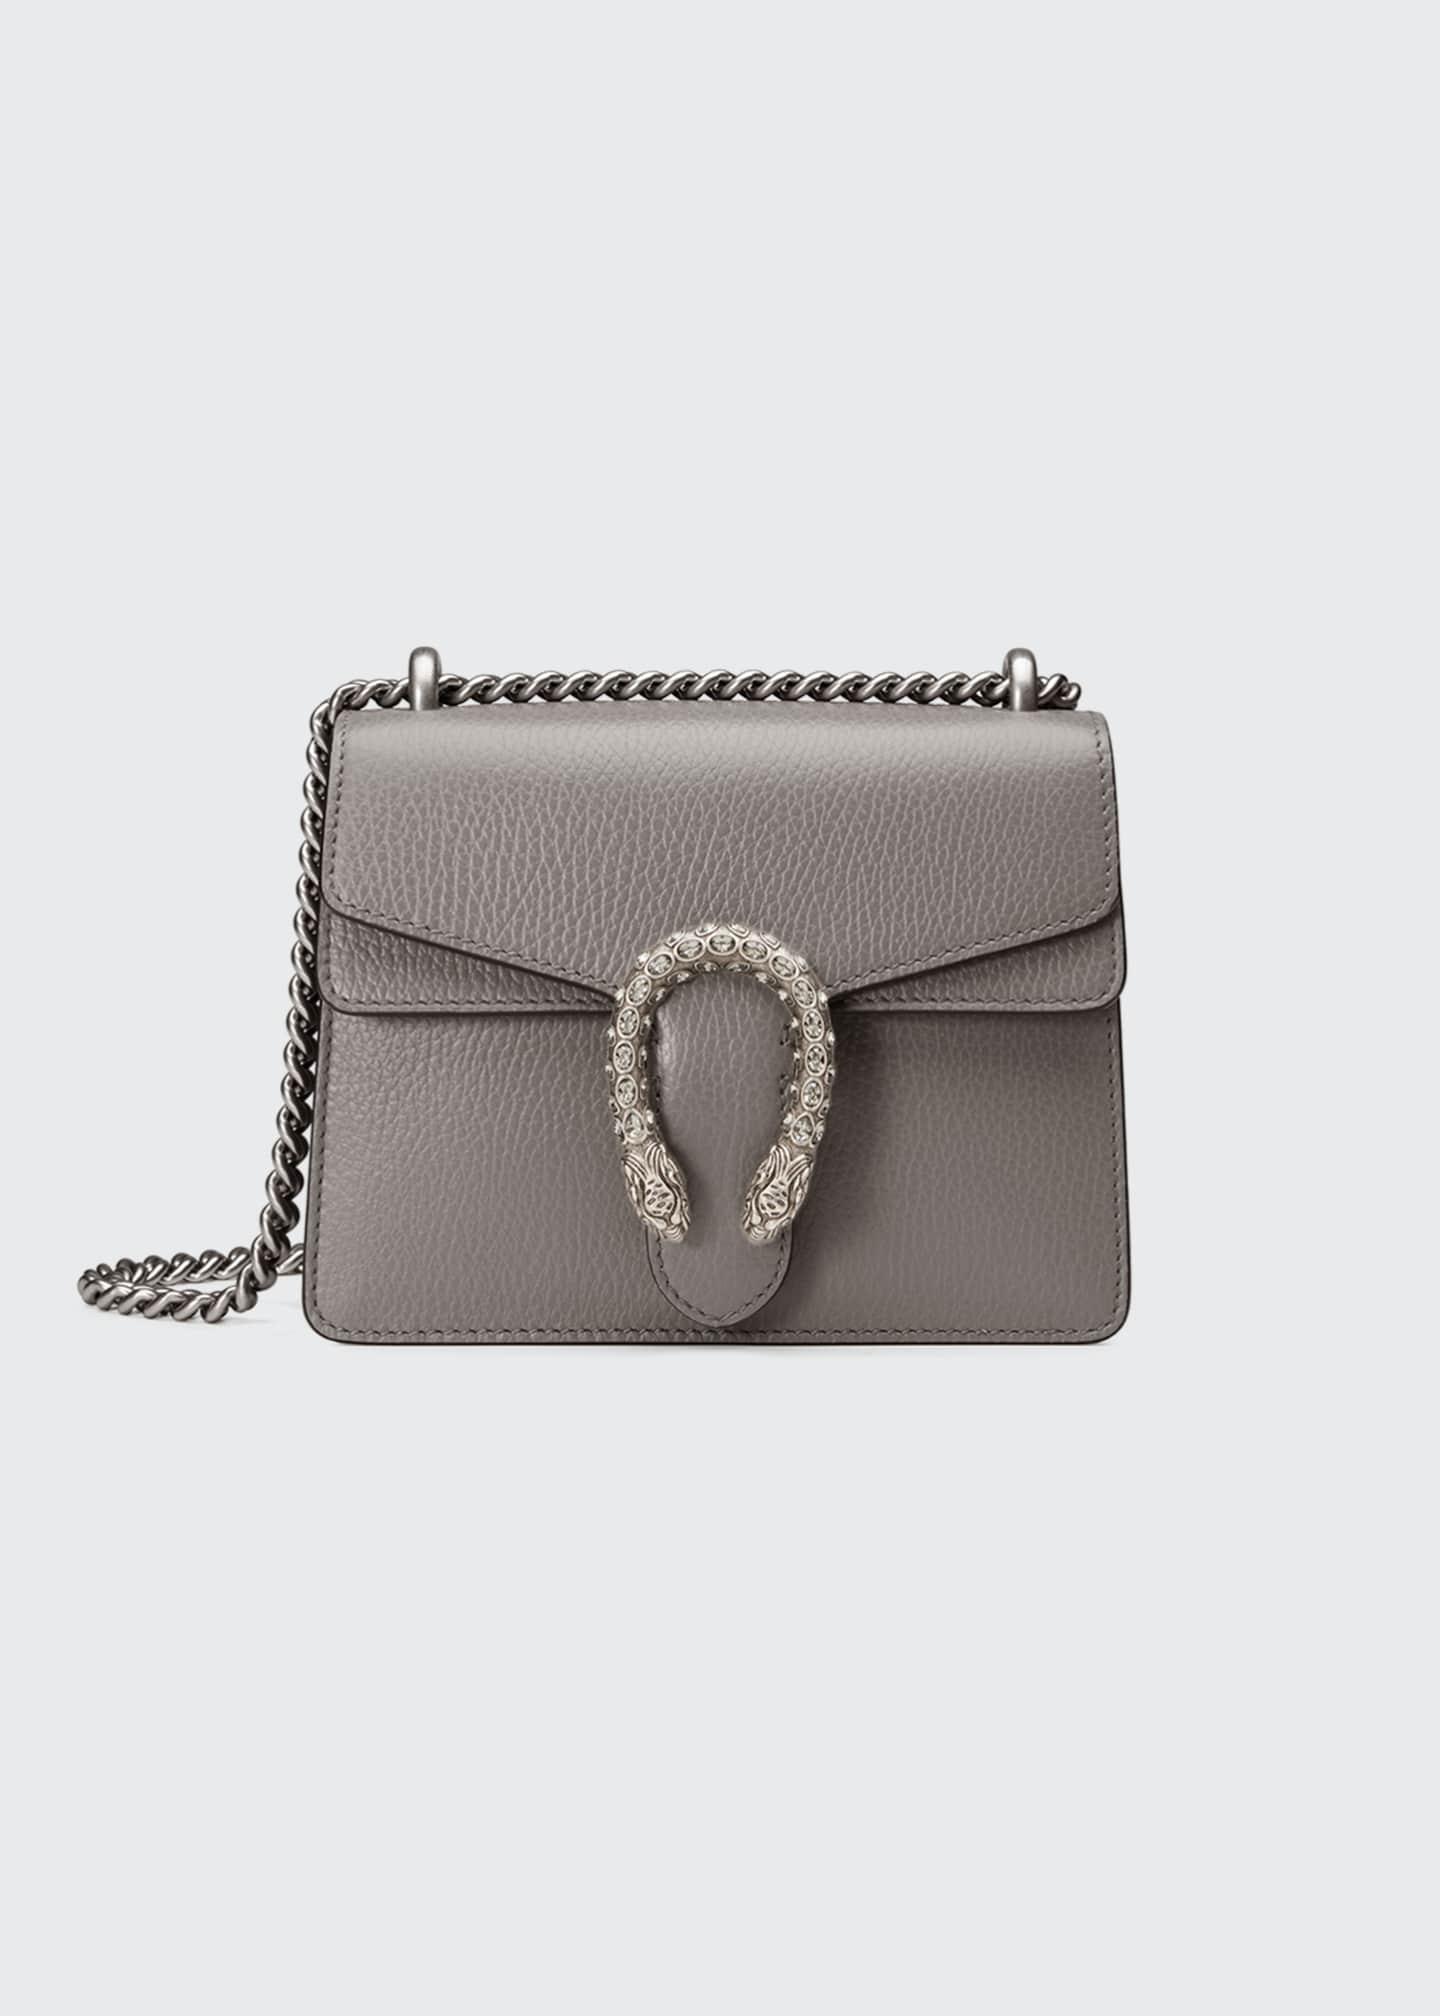 Gucci Dionysus Leather Crystal Mini Bag